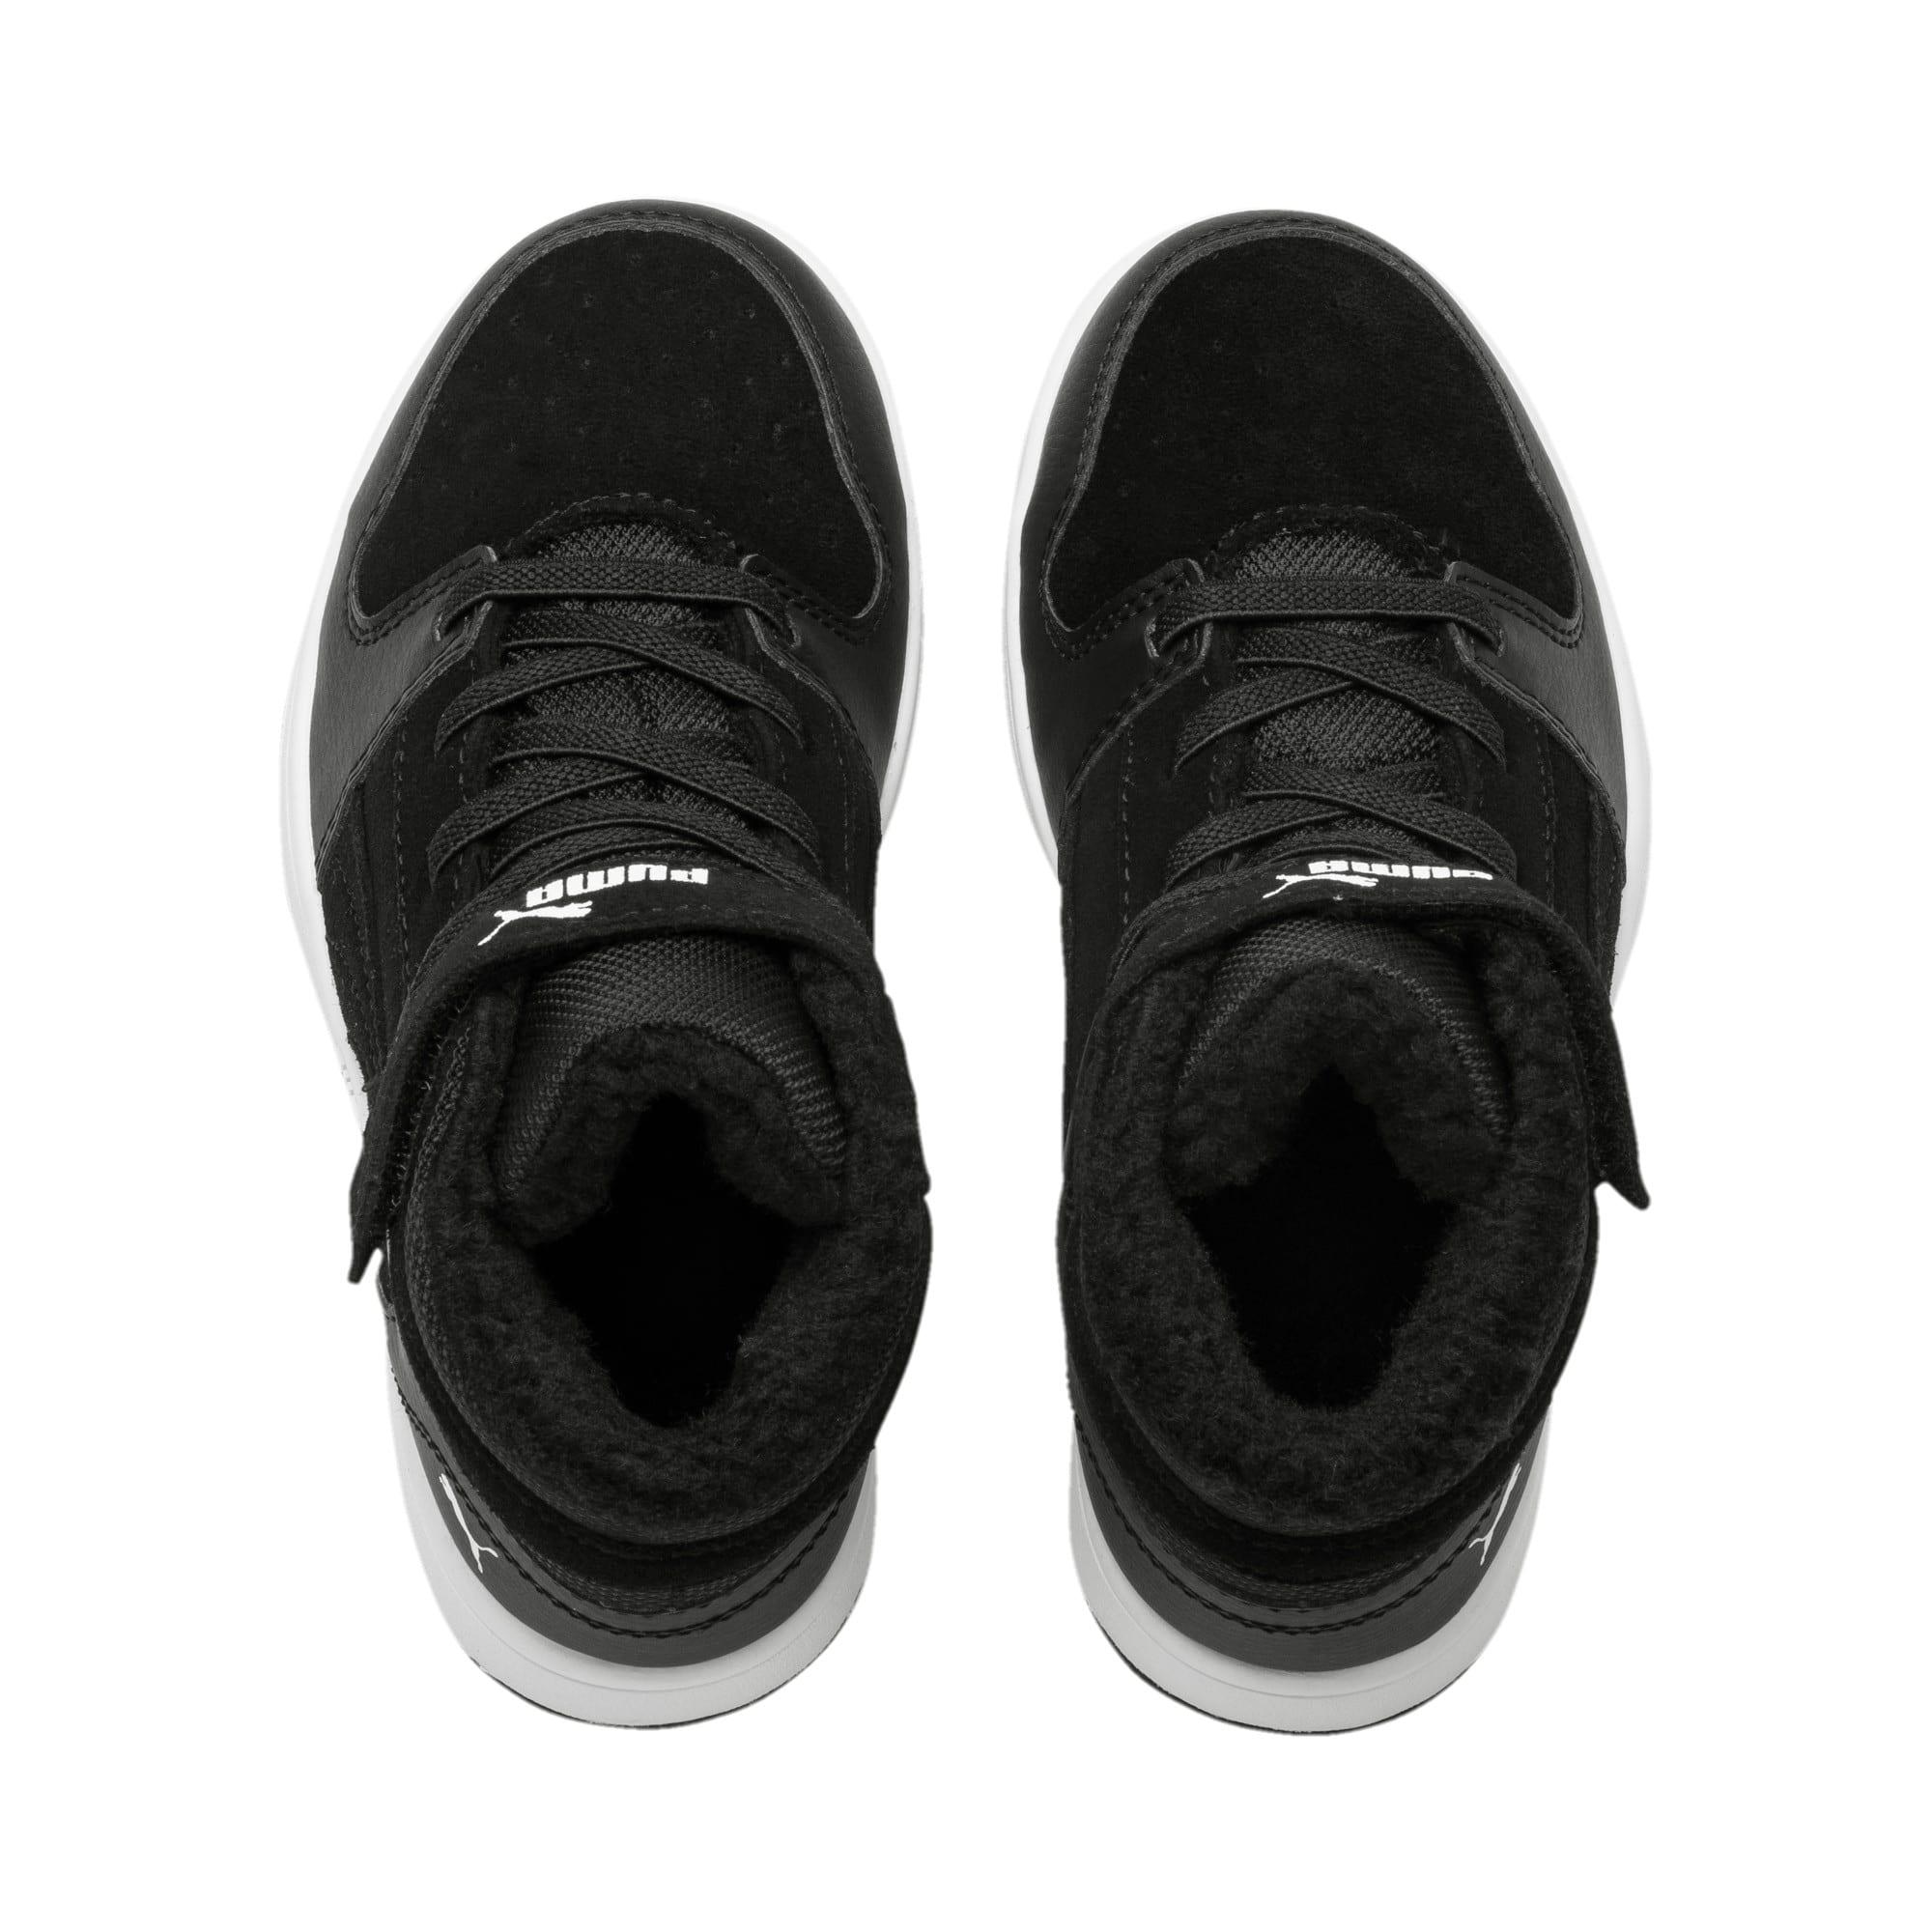 Thumbnail 6 of Rebound Lay-Up Fur V Kids Sneaker, Puma Black-Puma White, medium